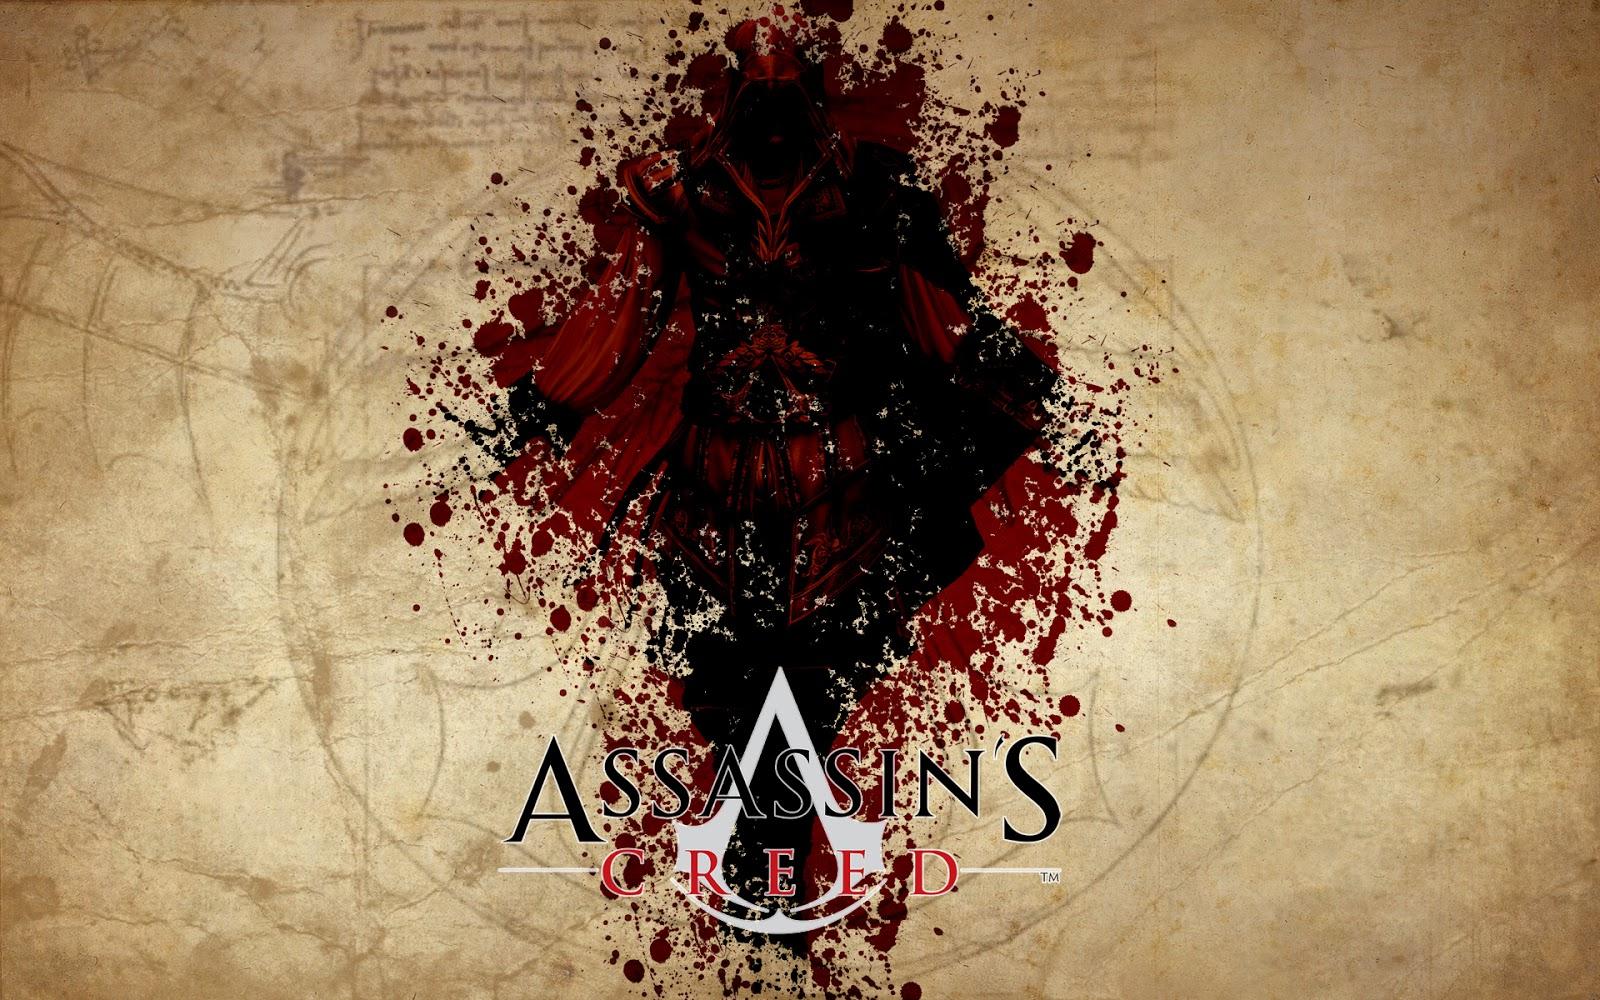 http://4.bp.blogspot.com/_Gq1jO6iuU2U/TSpd7lUYD5I/AAAAAAAAHZA/WlsWui9atos/s1600/Assassins_Creed_2_Wallpaper_HD.jpg